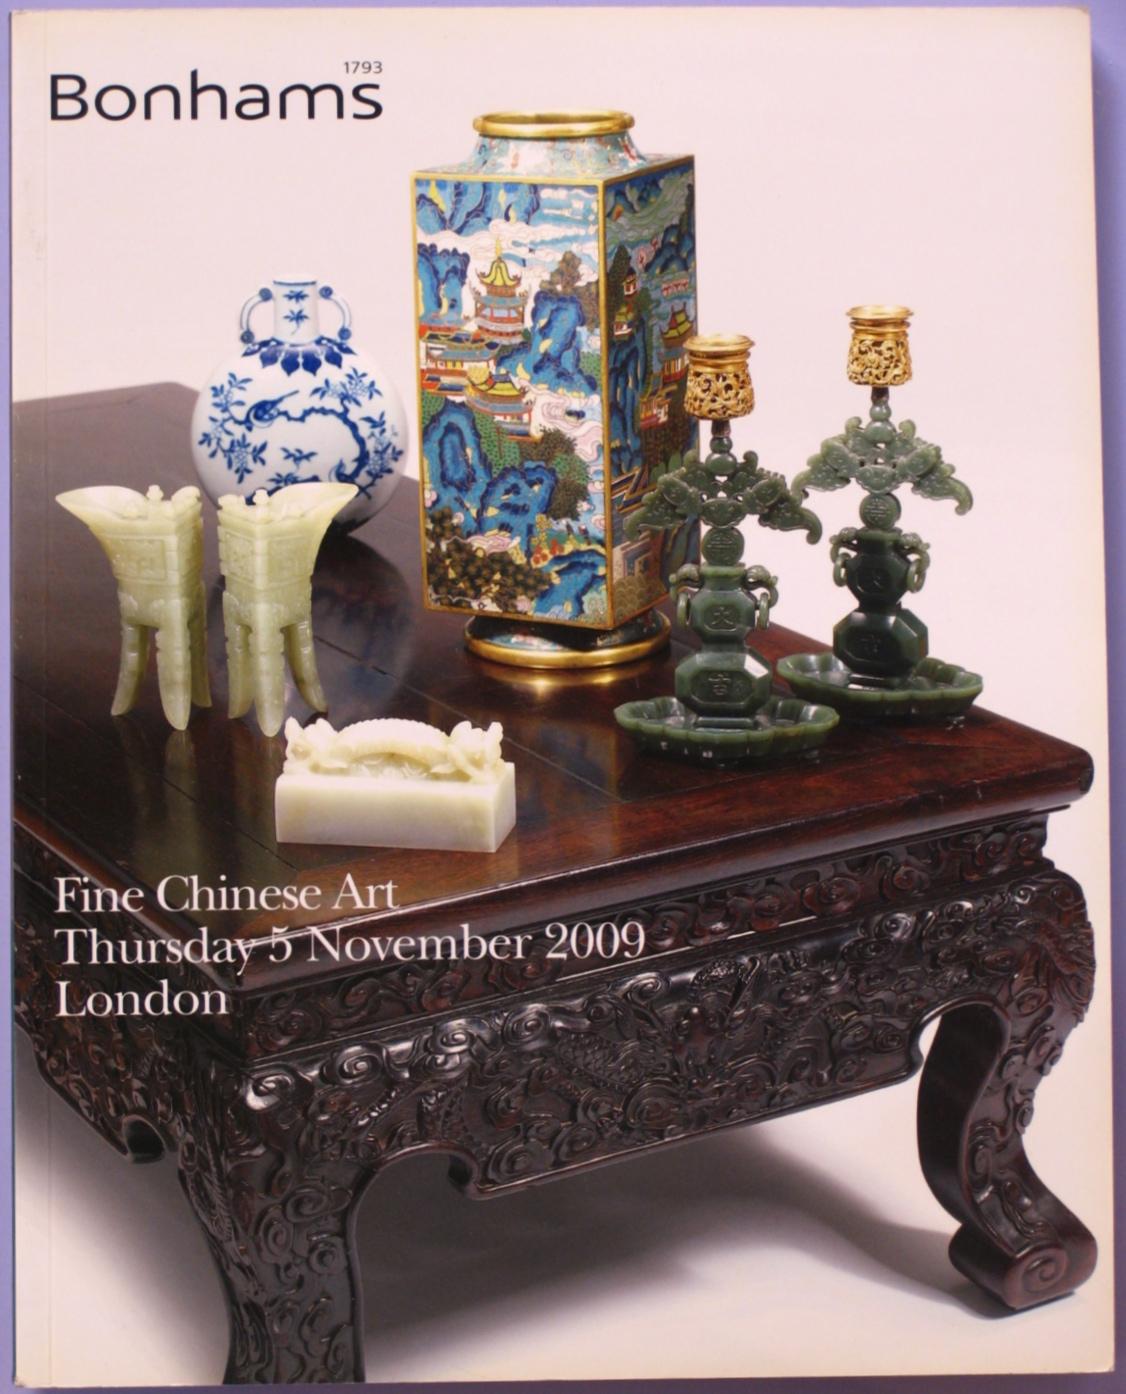 BL20091105: Bookshop: [2009] Bonhams London Fine Chinese Art